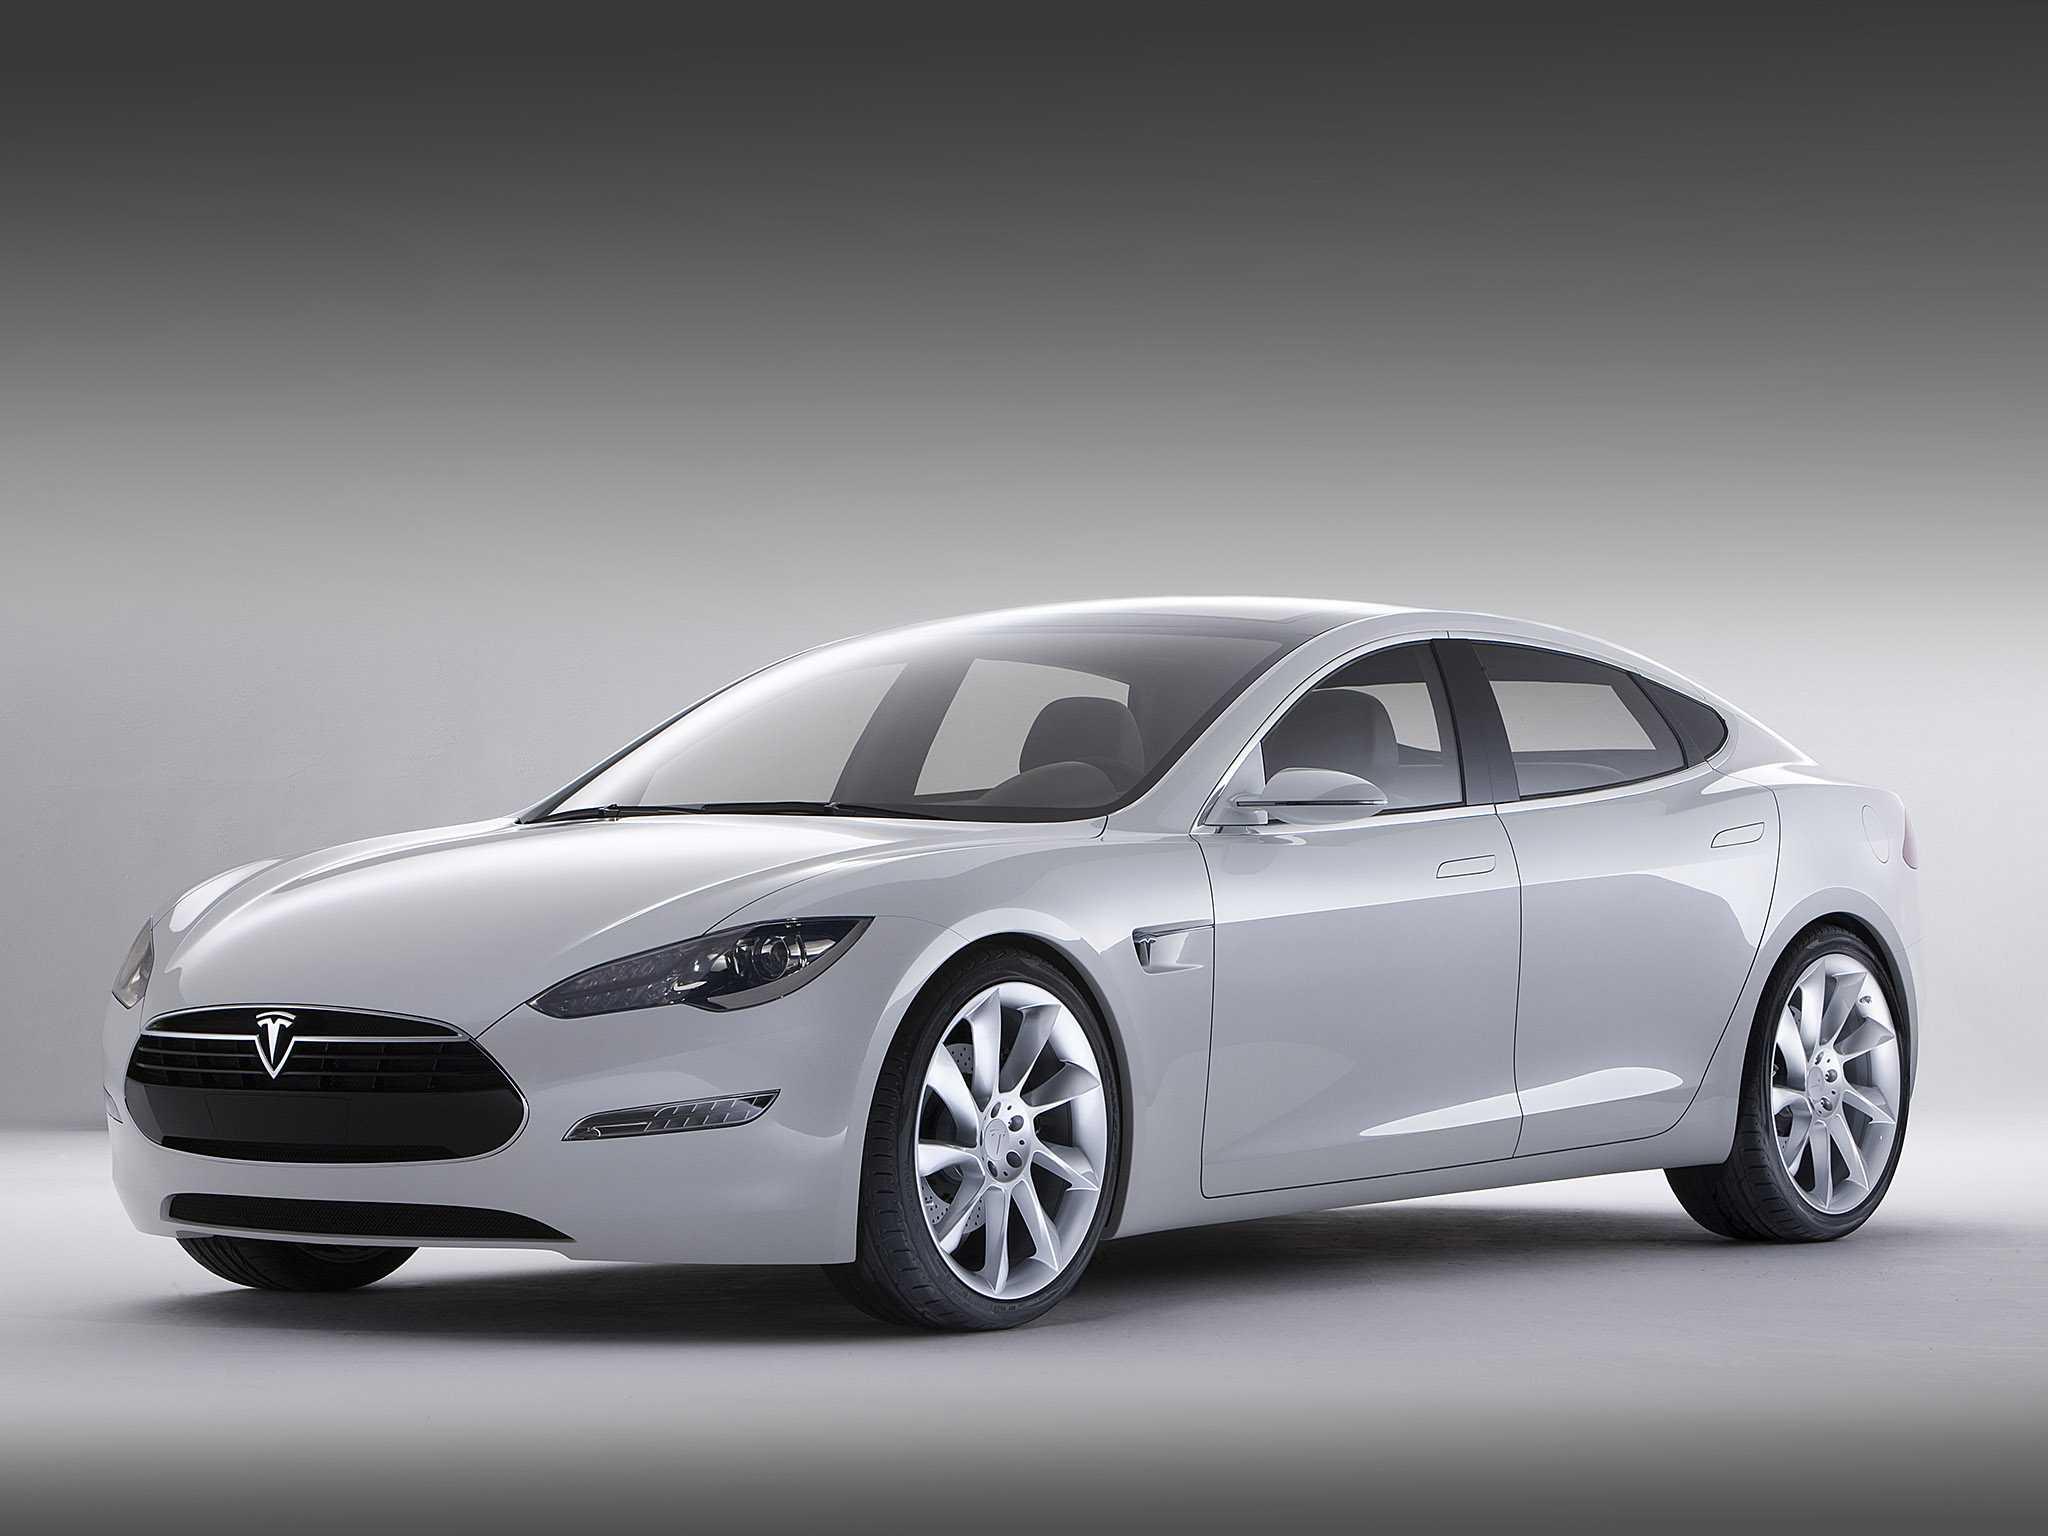 Tesla Promote Next Gen Model S60 as Entry Level E